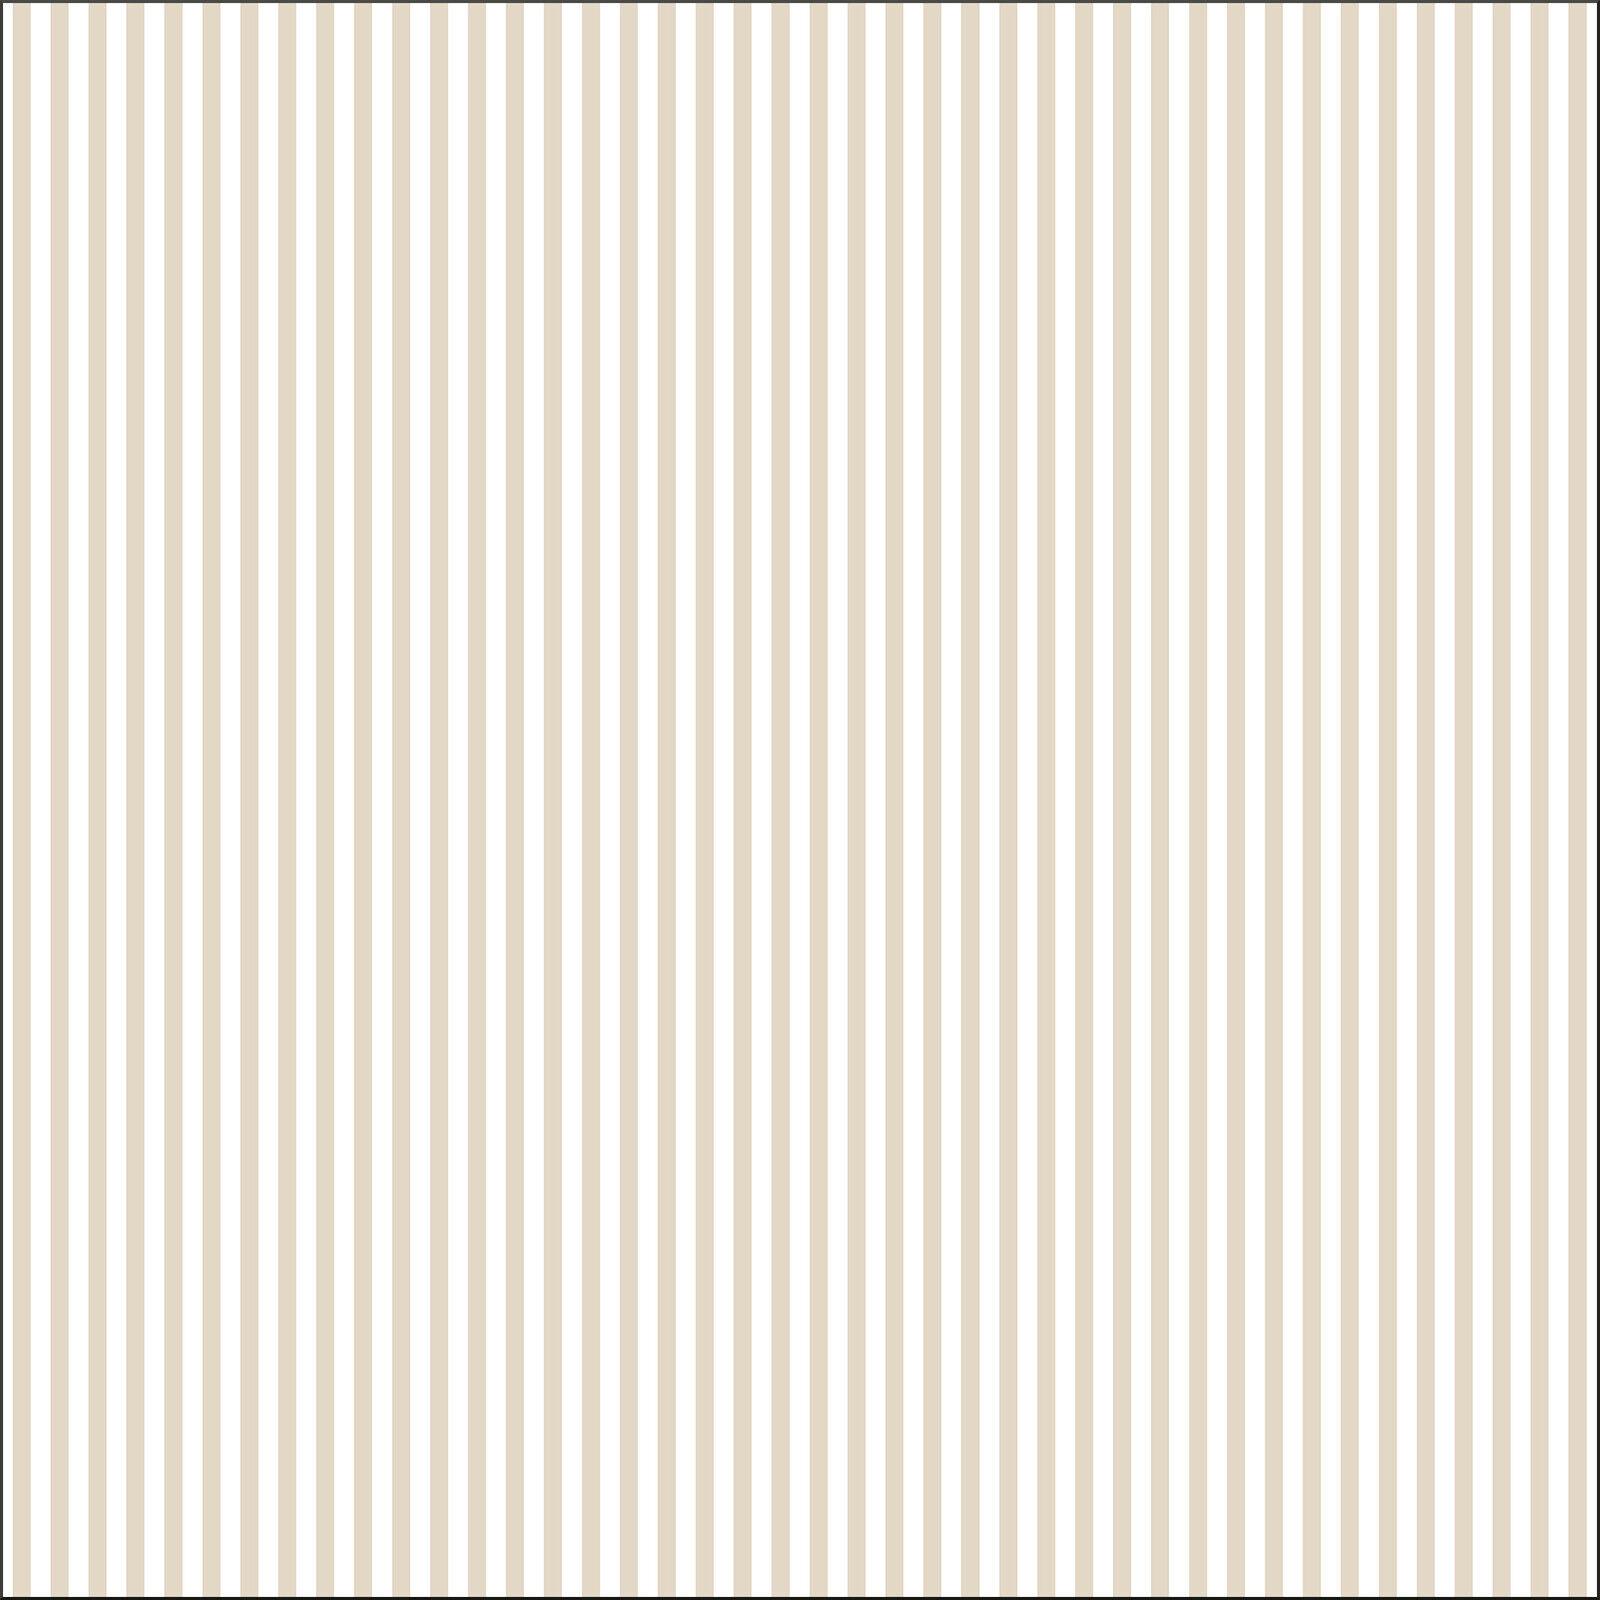 Essener Tapete Simply Stripes II SY33960 Streifentapete feiner Streifen